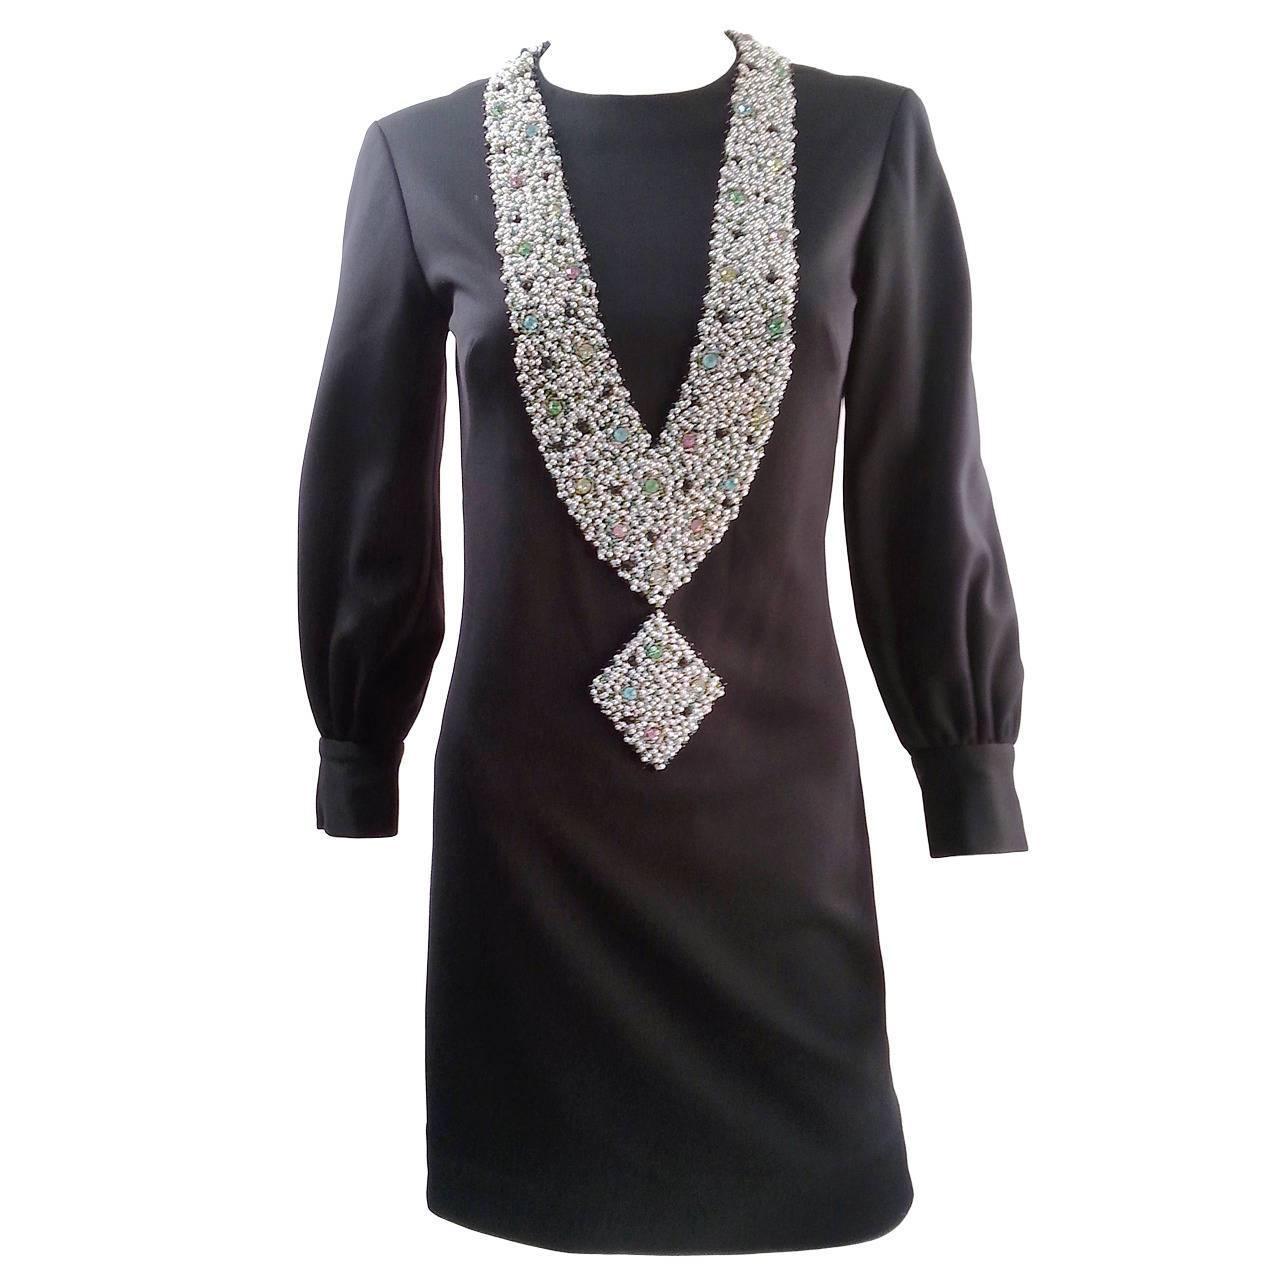 1960s Oscar de la Renta Tromp L'oeil Necklace Dress